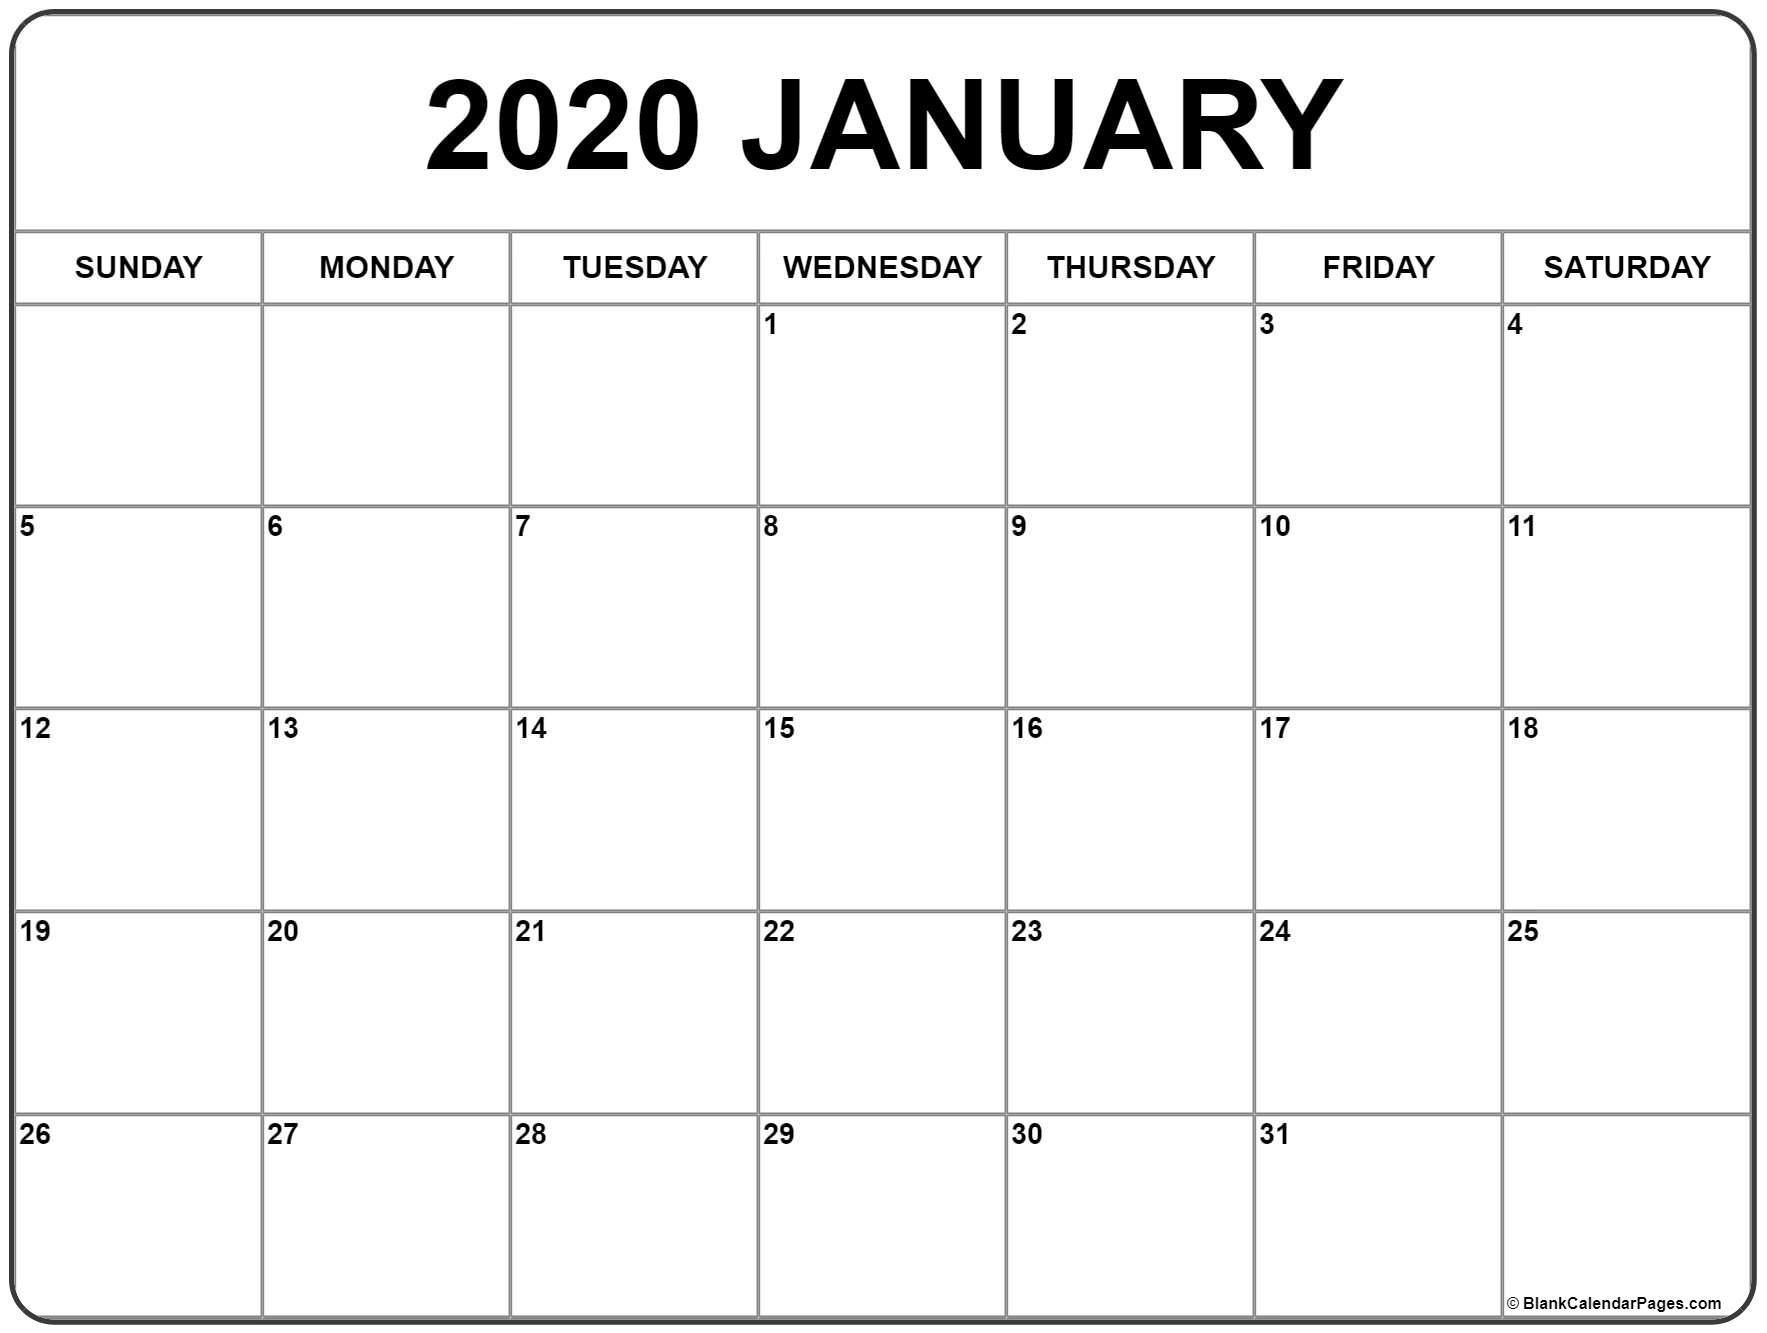 January 2020 Calendar | Free Printable Monthly Calendars-Large January 2020 Calendar